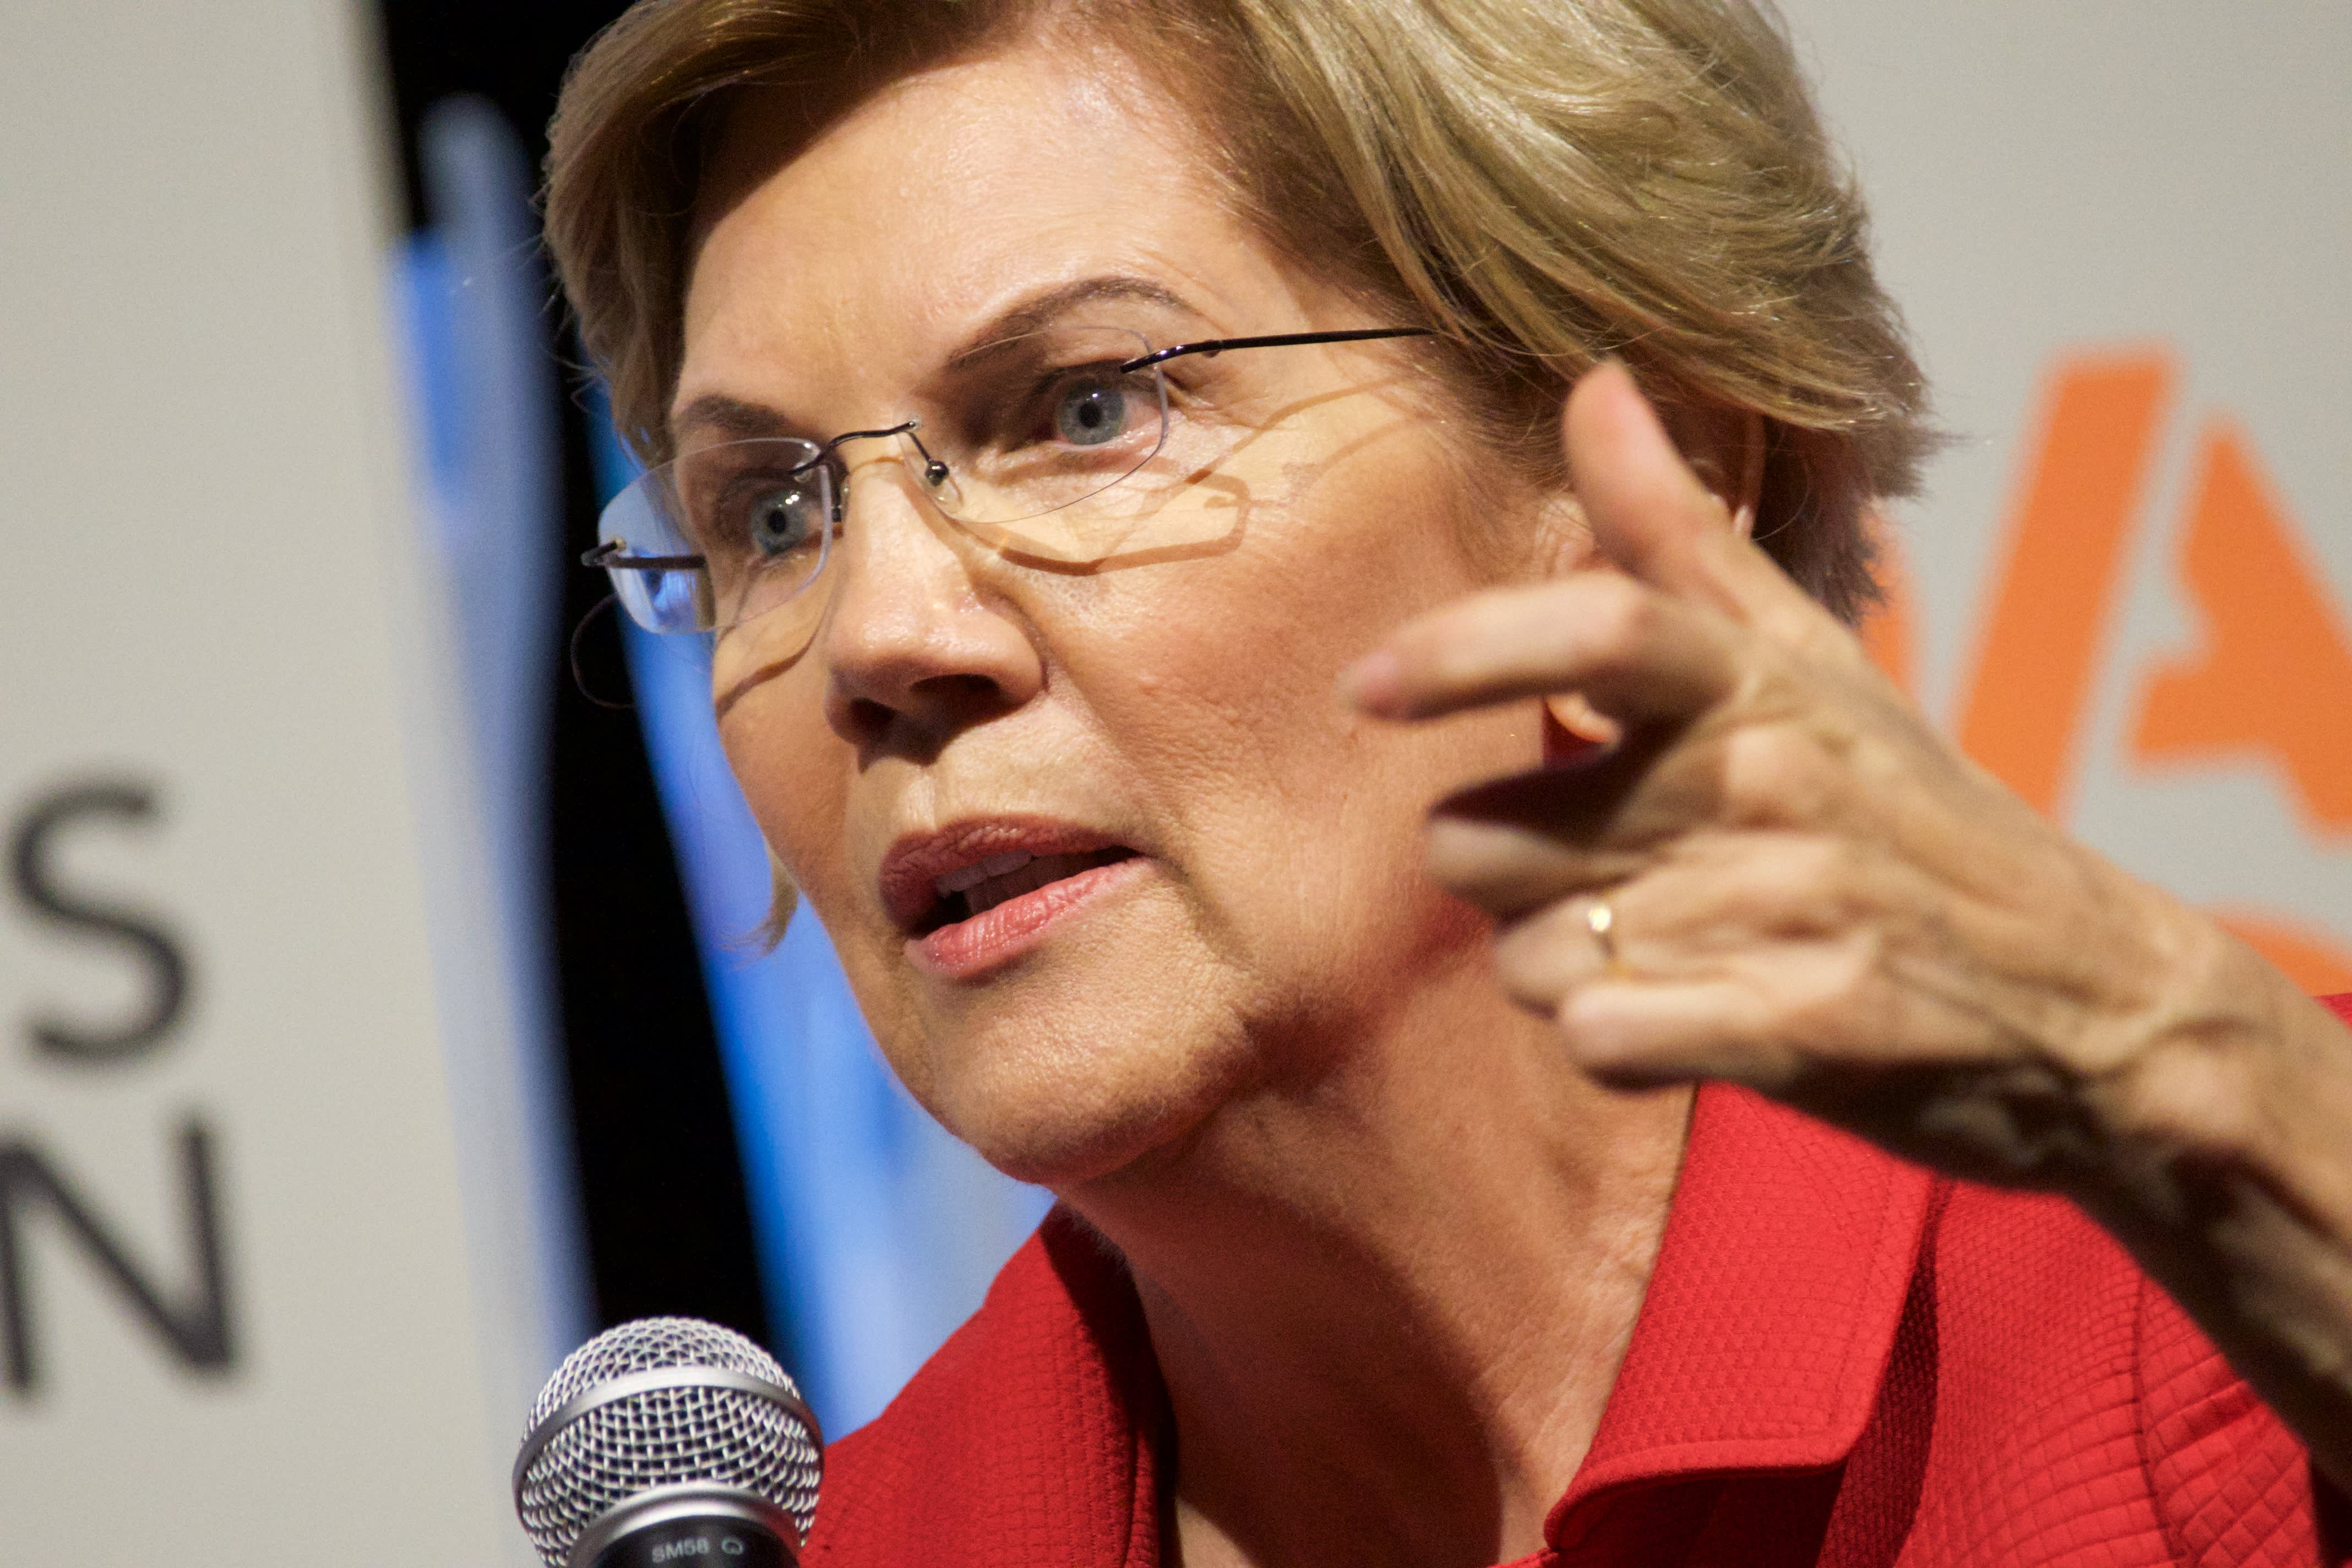 Elizabeth Warren's wealth tax would raise $1 trillion less than she estimates, Wharton study shows